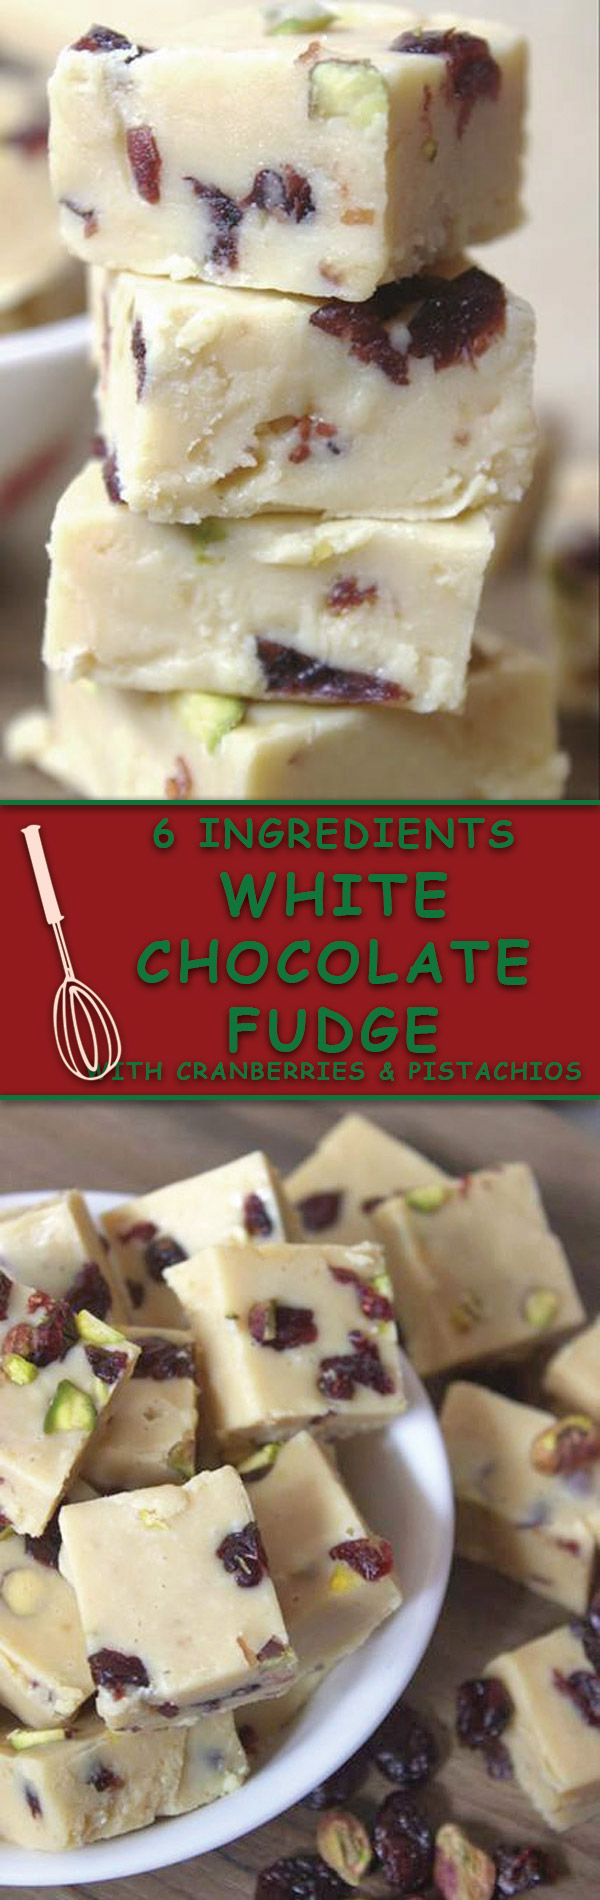 Easy 6 Ingredient White Chocolate Cranberry Pistachio Fudge | Naive ...